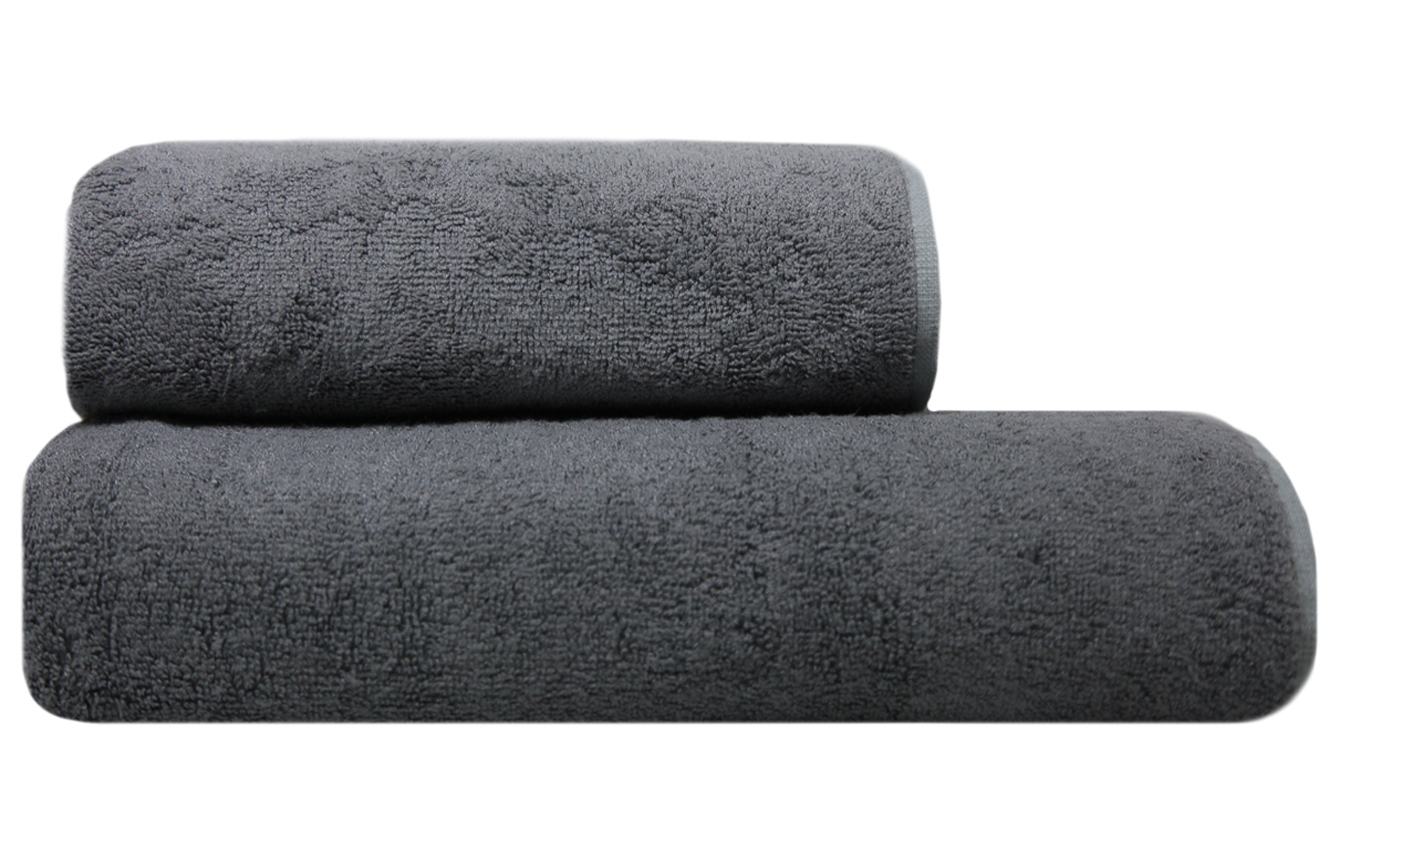 LISCIO - Bamboo-line - asciugamano 100 % bamboo (30 x 50)